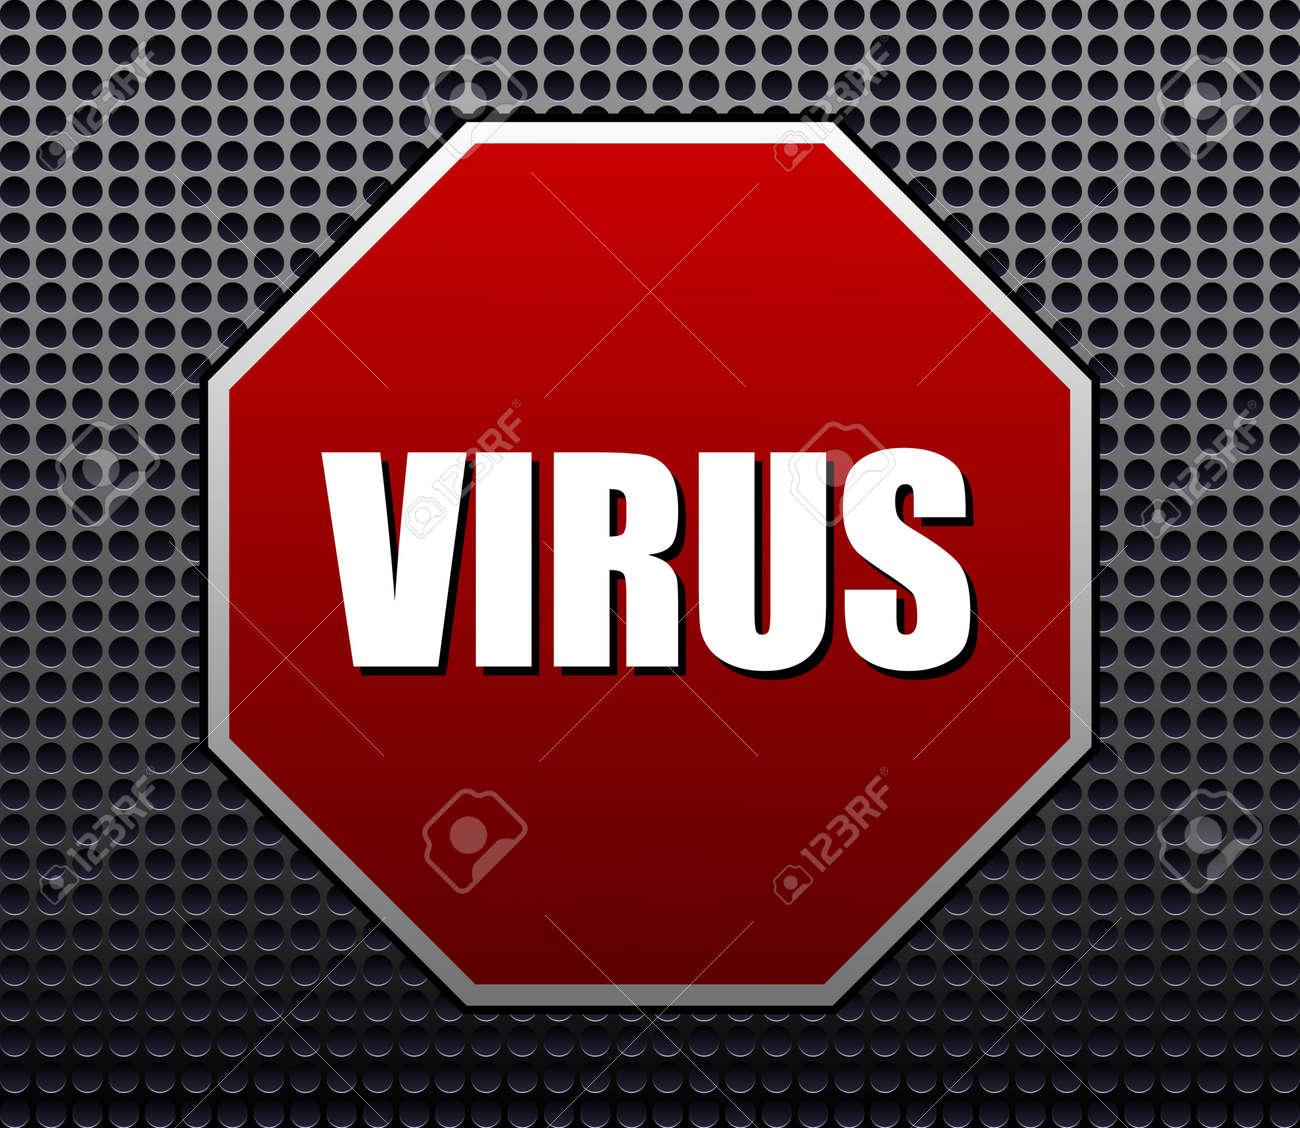 Cyber attacks vector sign Stock Vector - 17443702